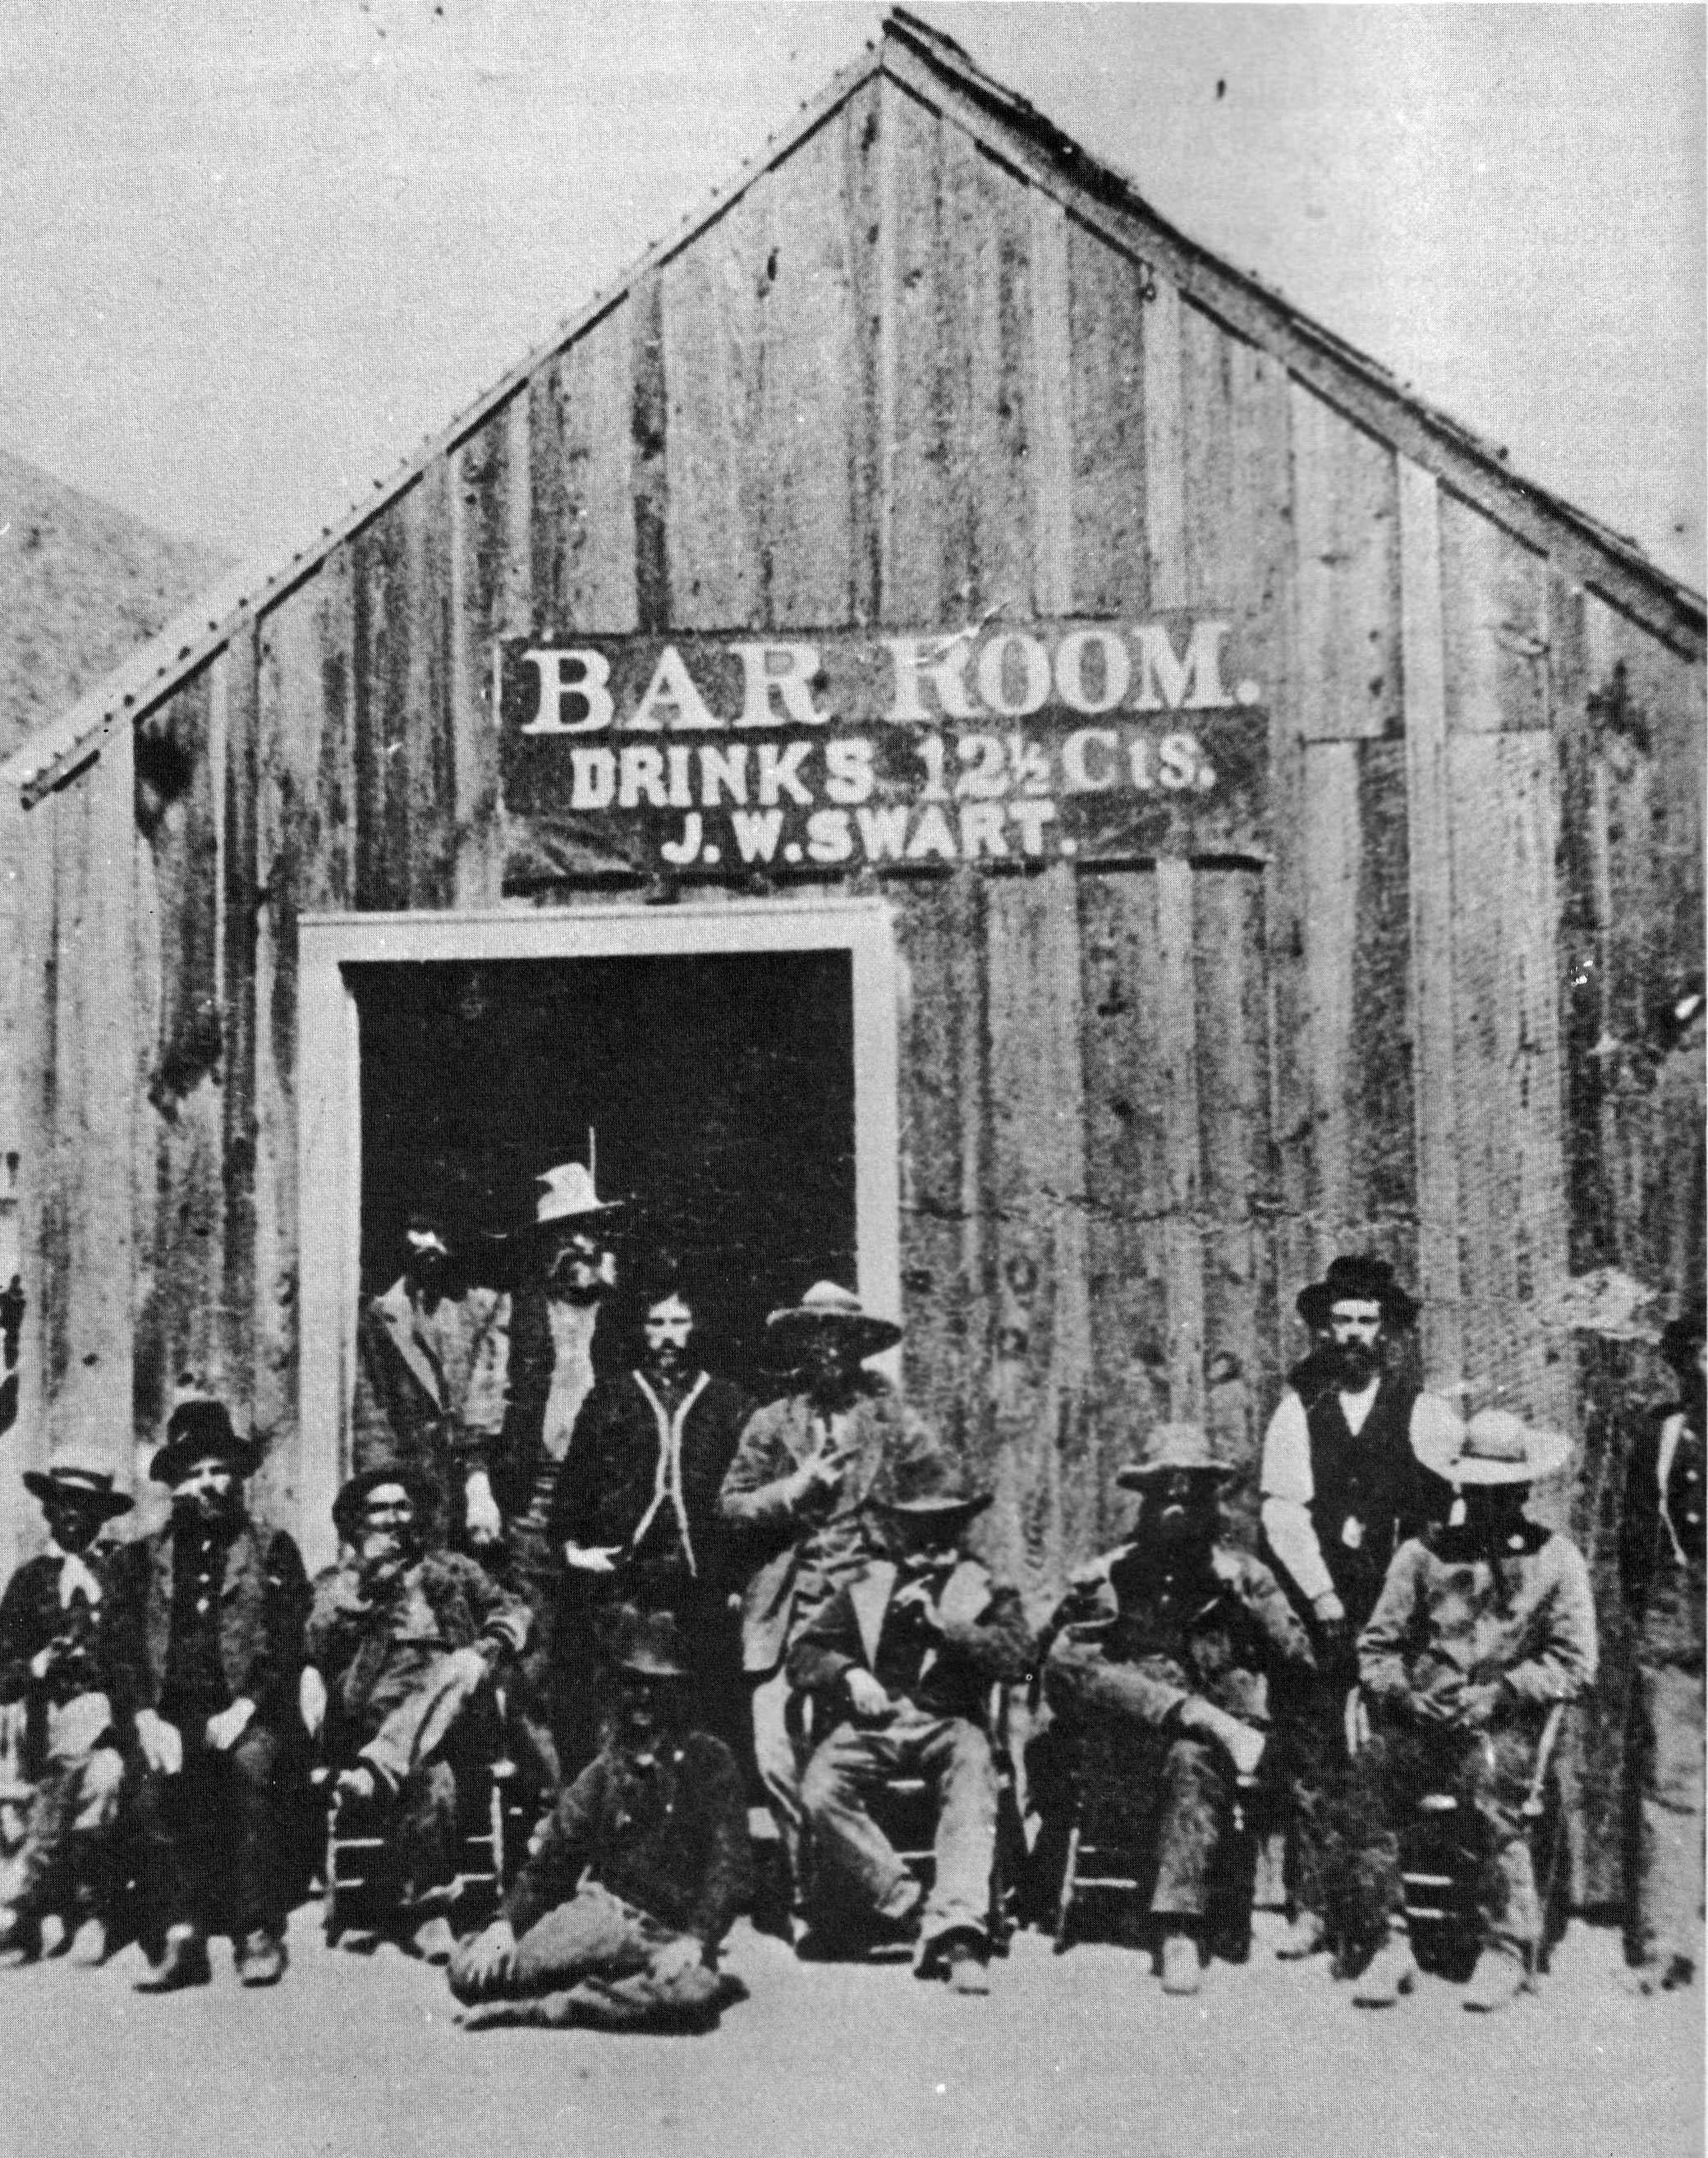 Description Charleston J W Swarts Saloon year 1885.jpg